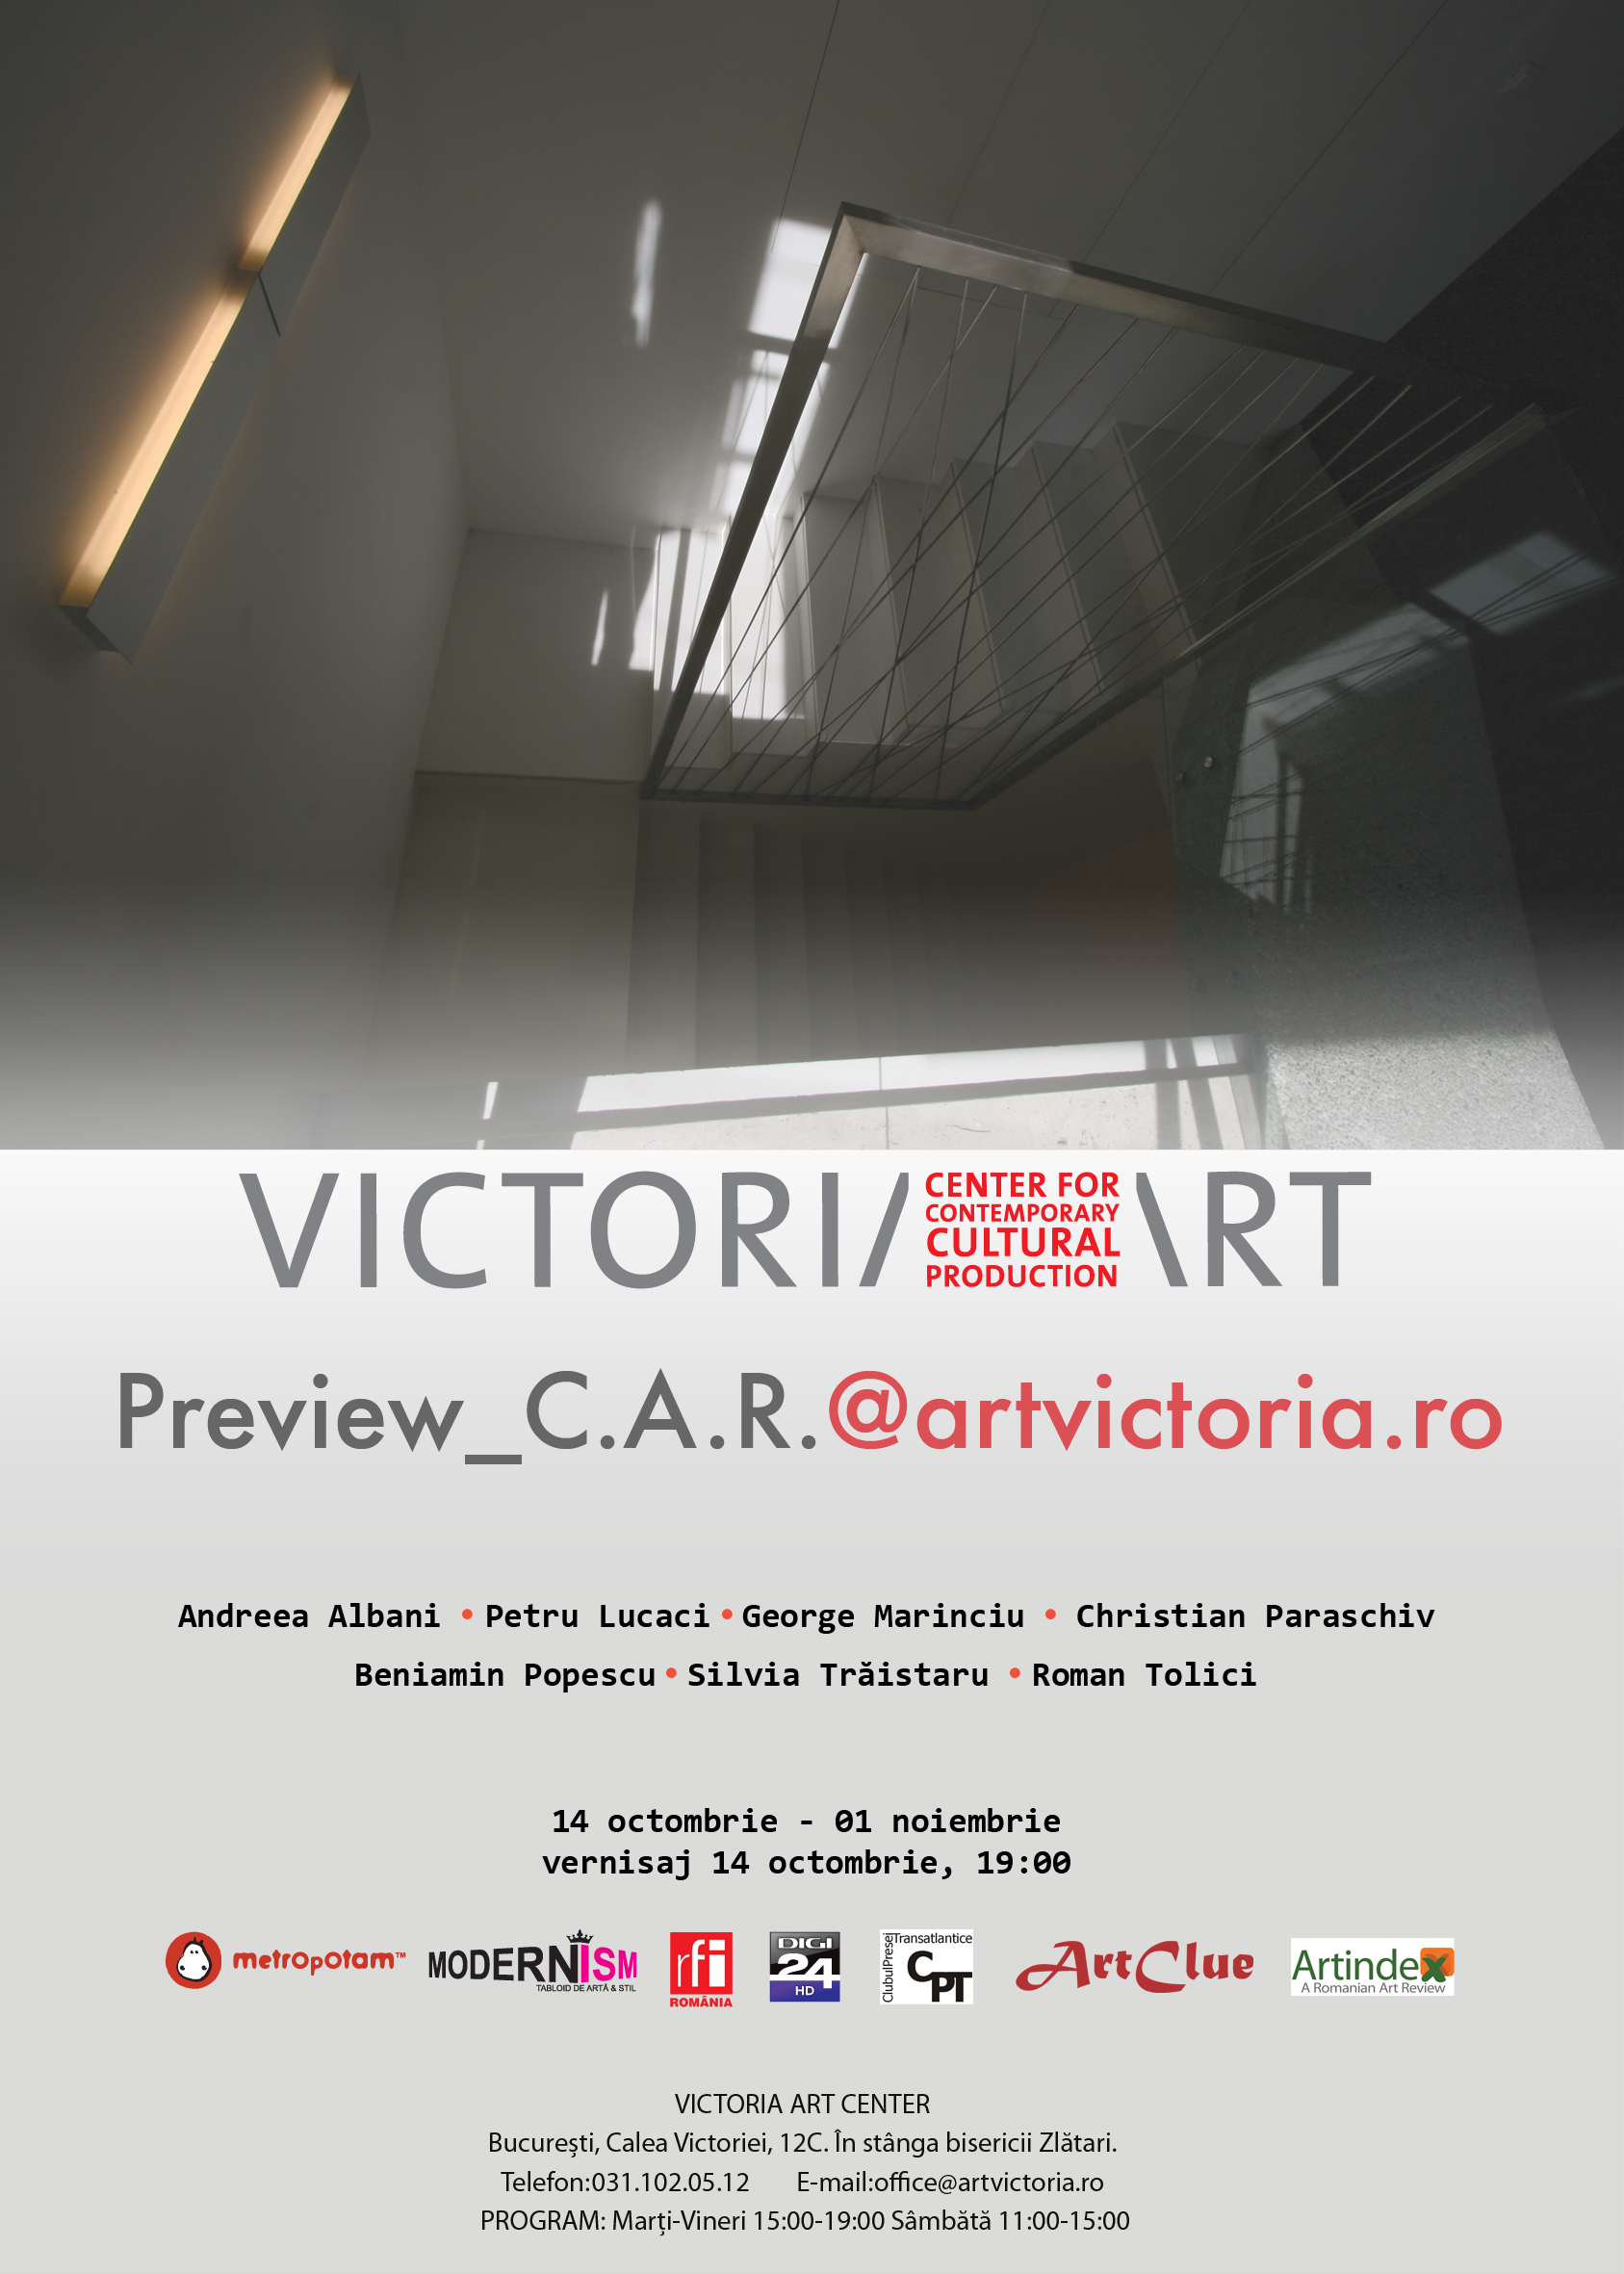 Preview_C.A.R. @ artvictoria.ro